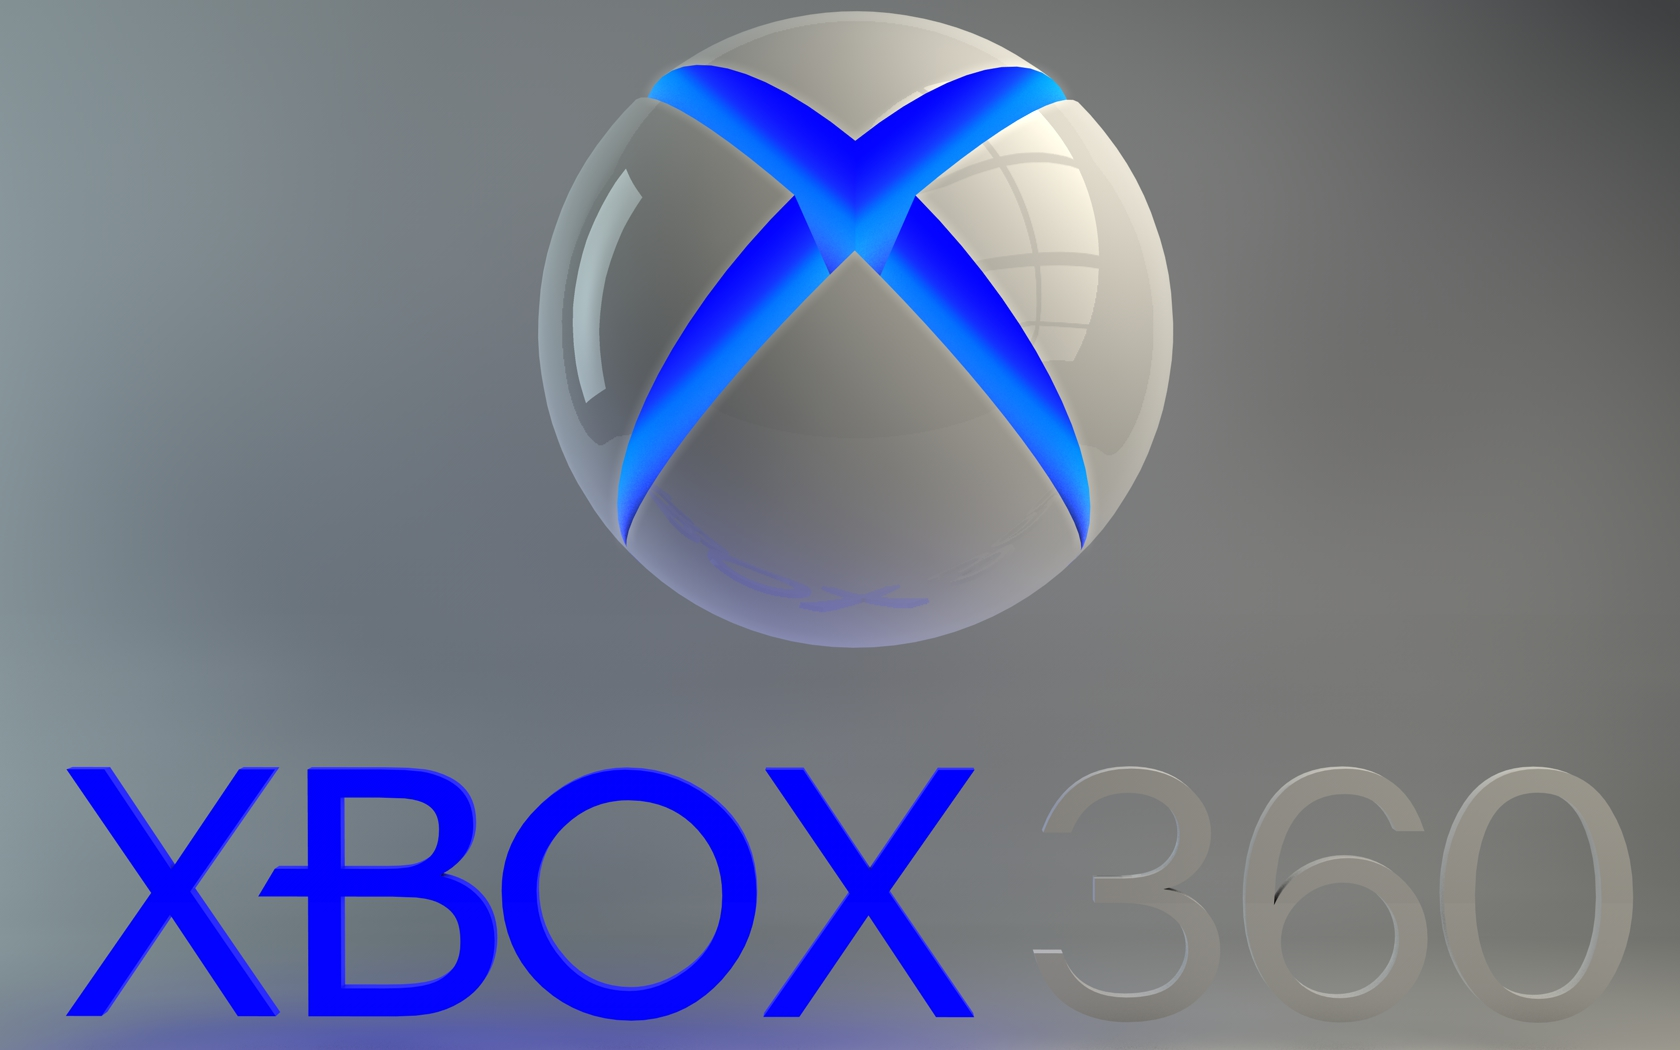 XBOX 360 Logo by Dracu-Teufel666 on deviantARTXbox Logo Ball